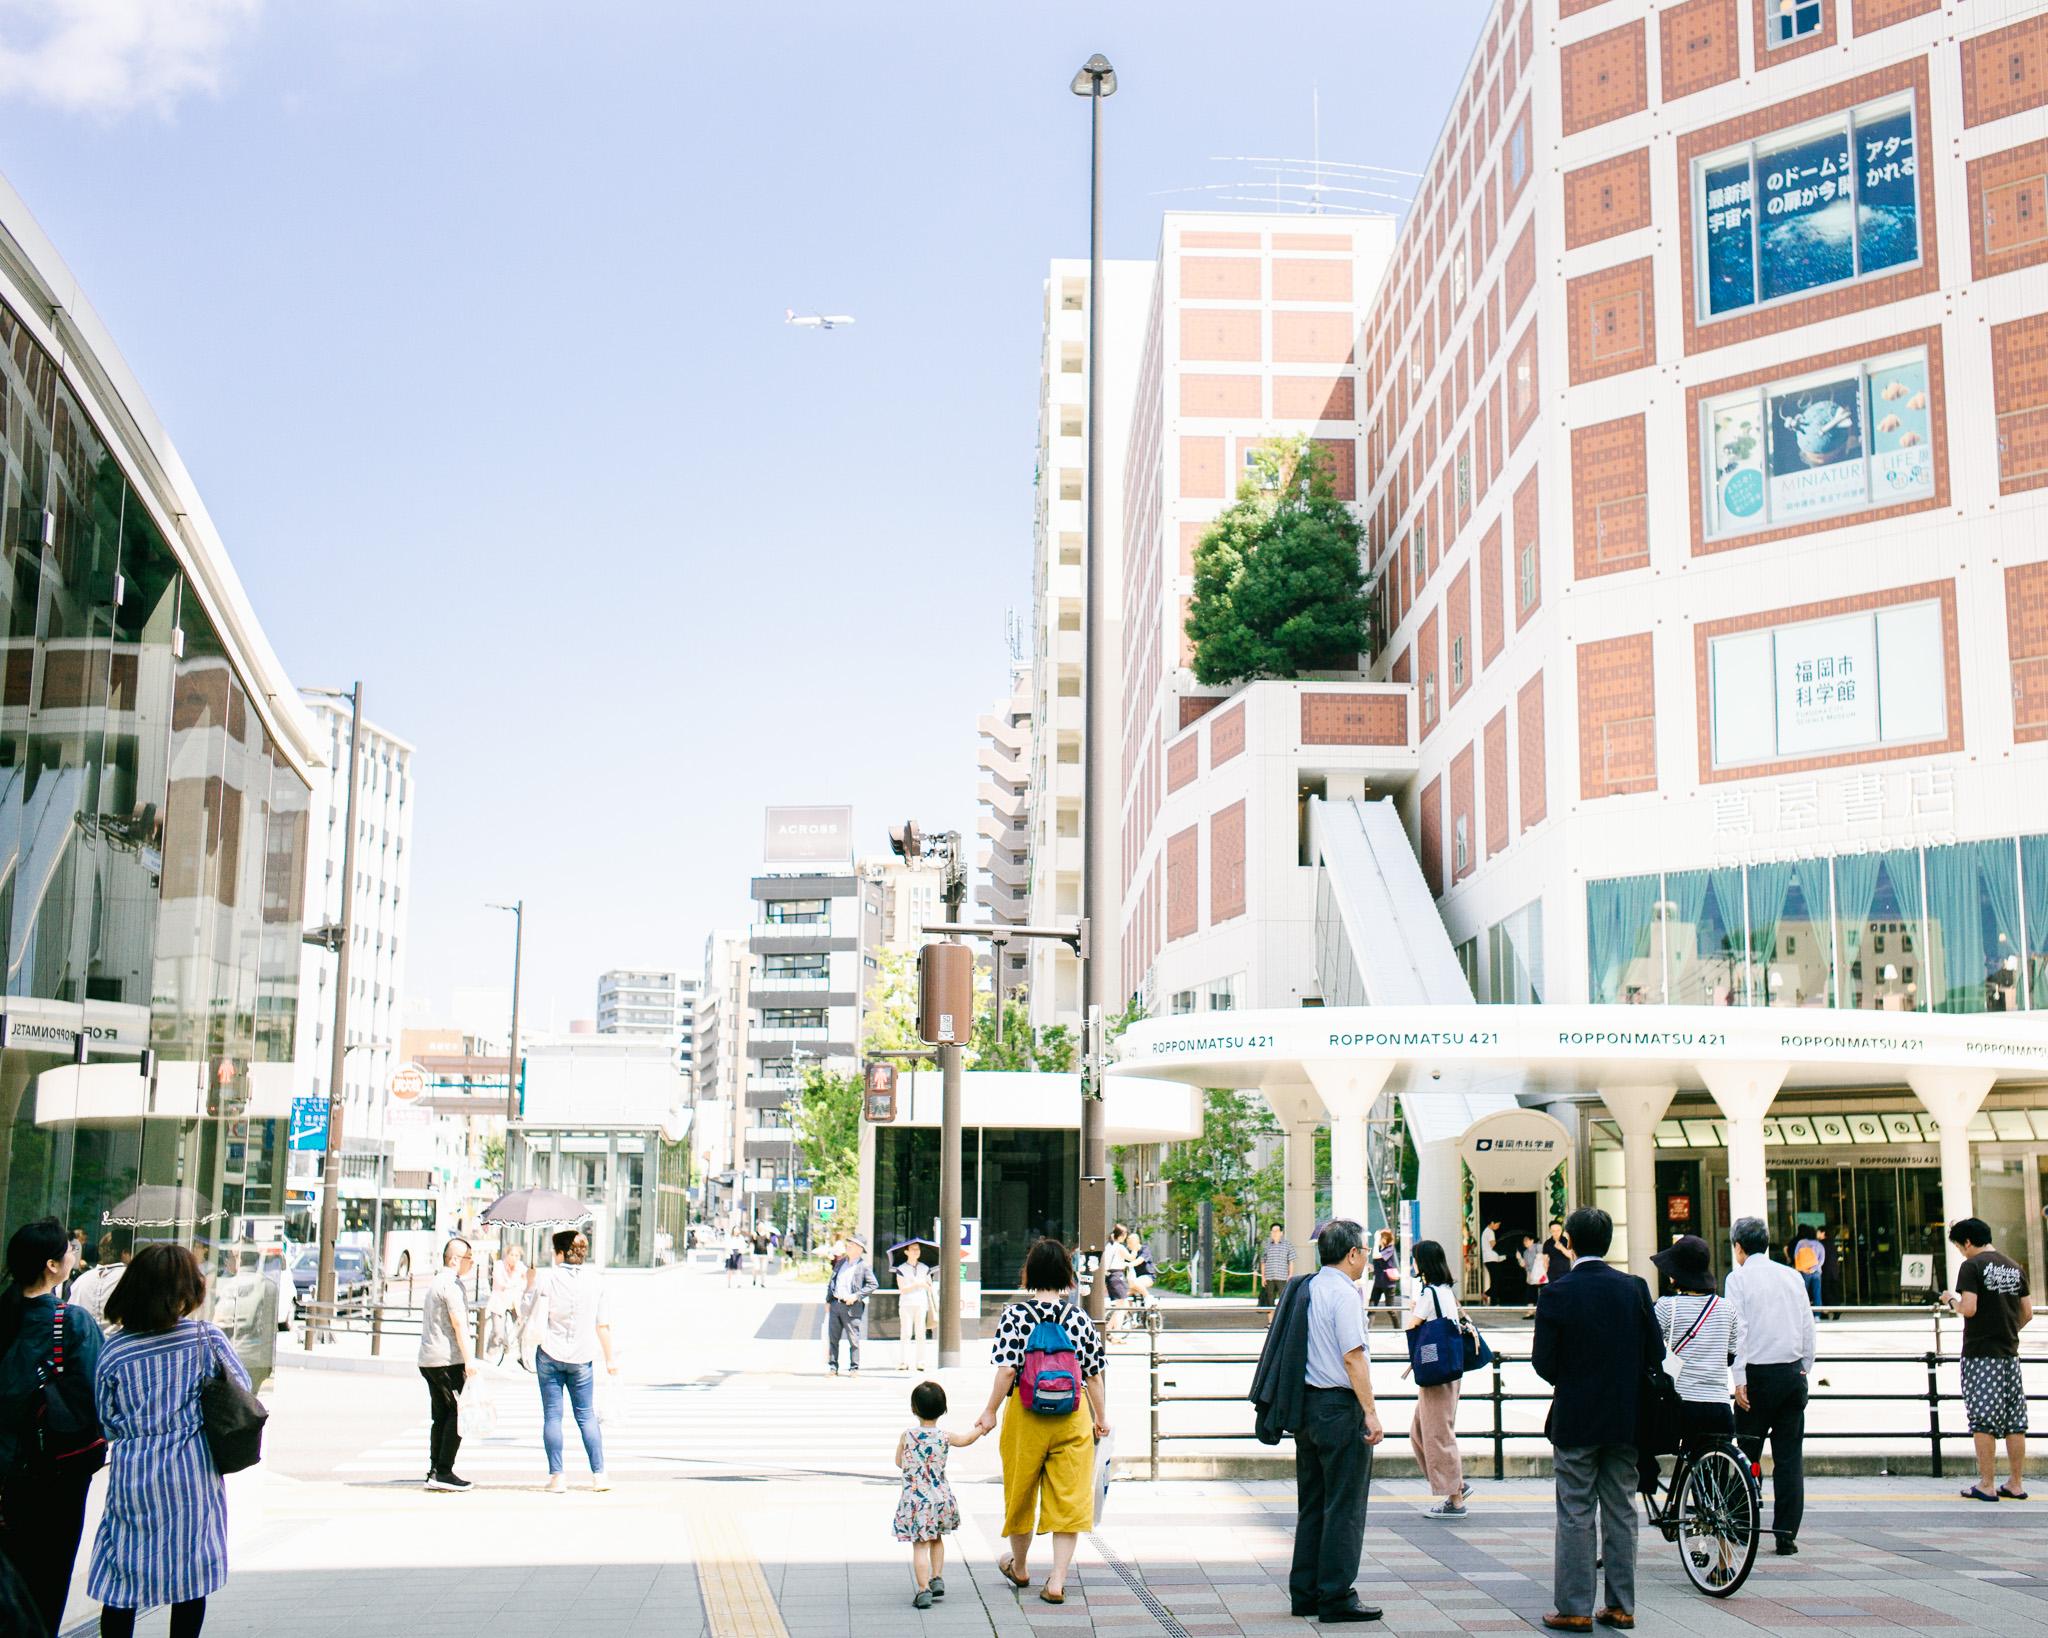 ropponmatsu station